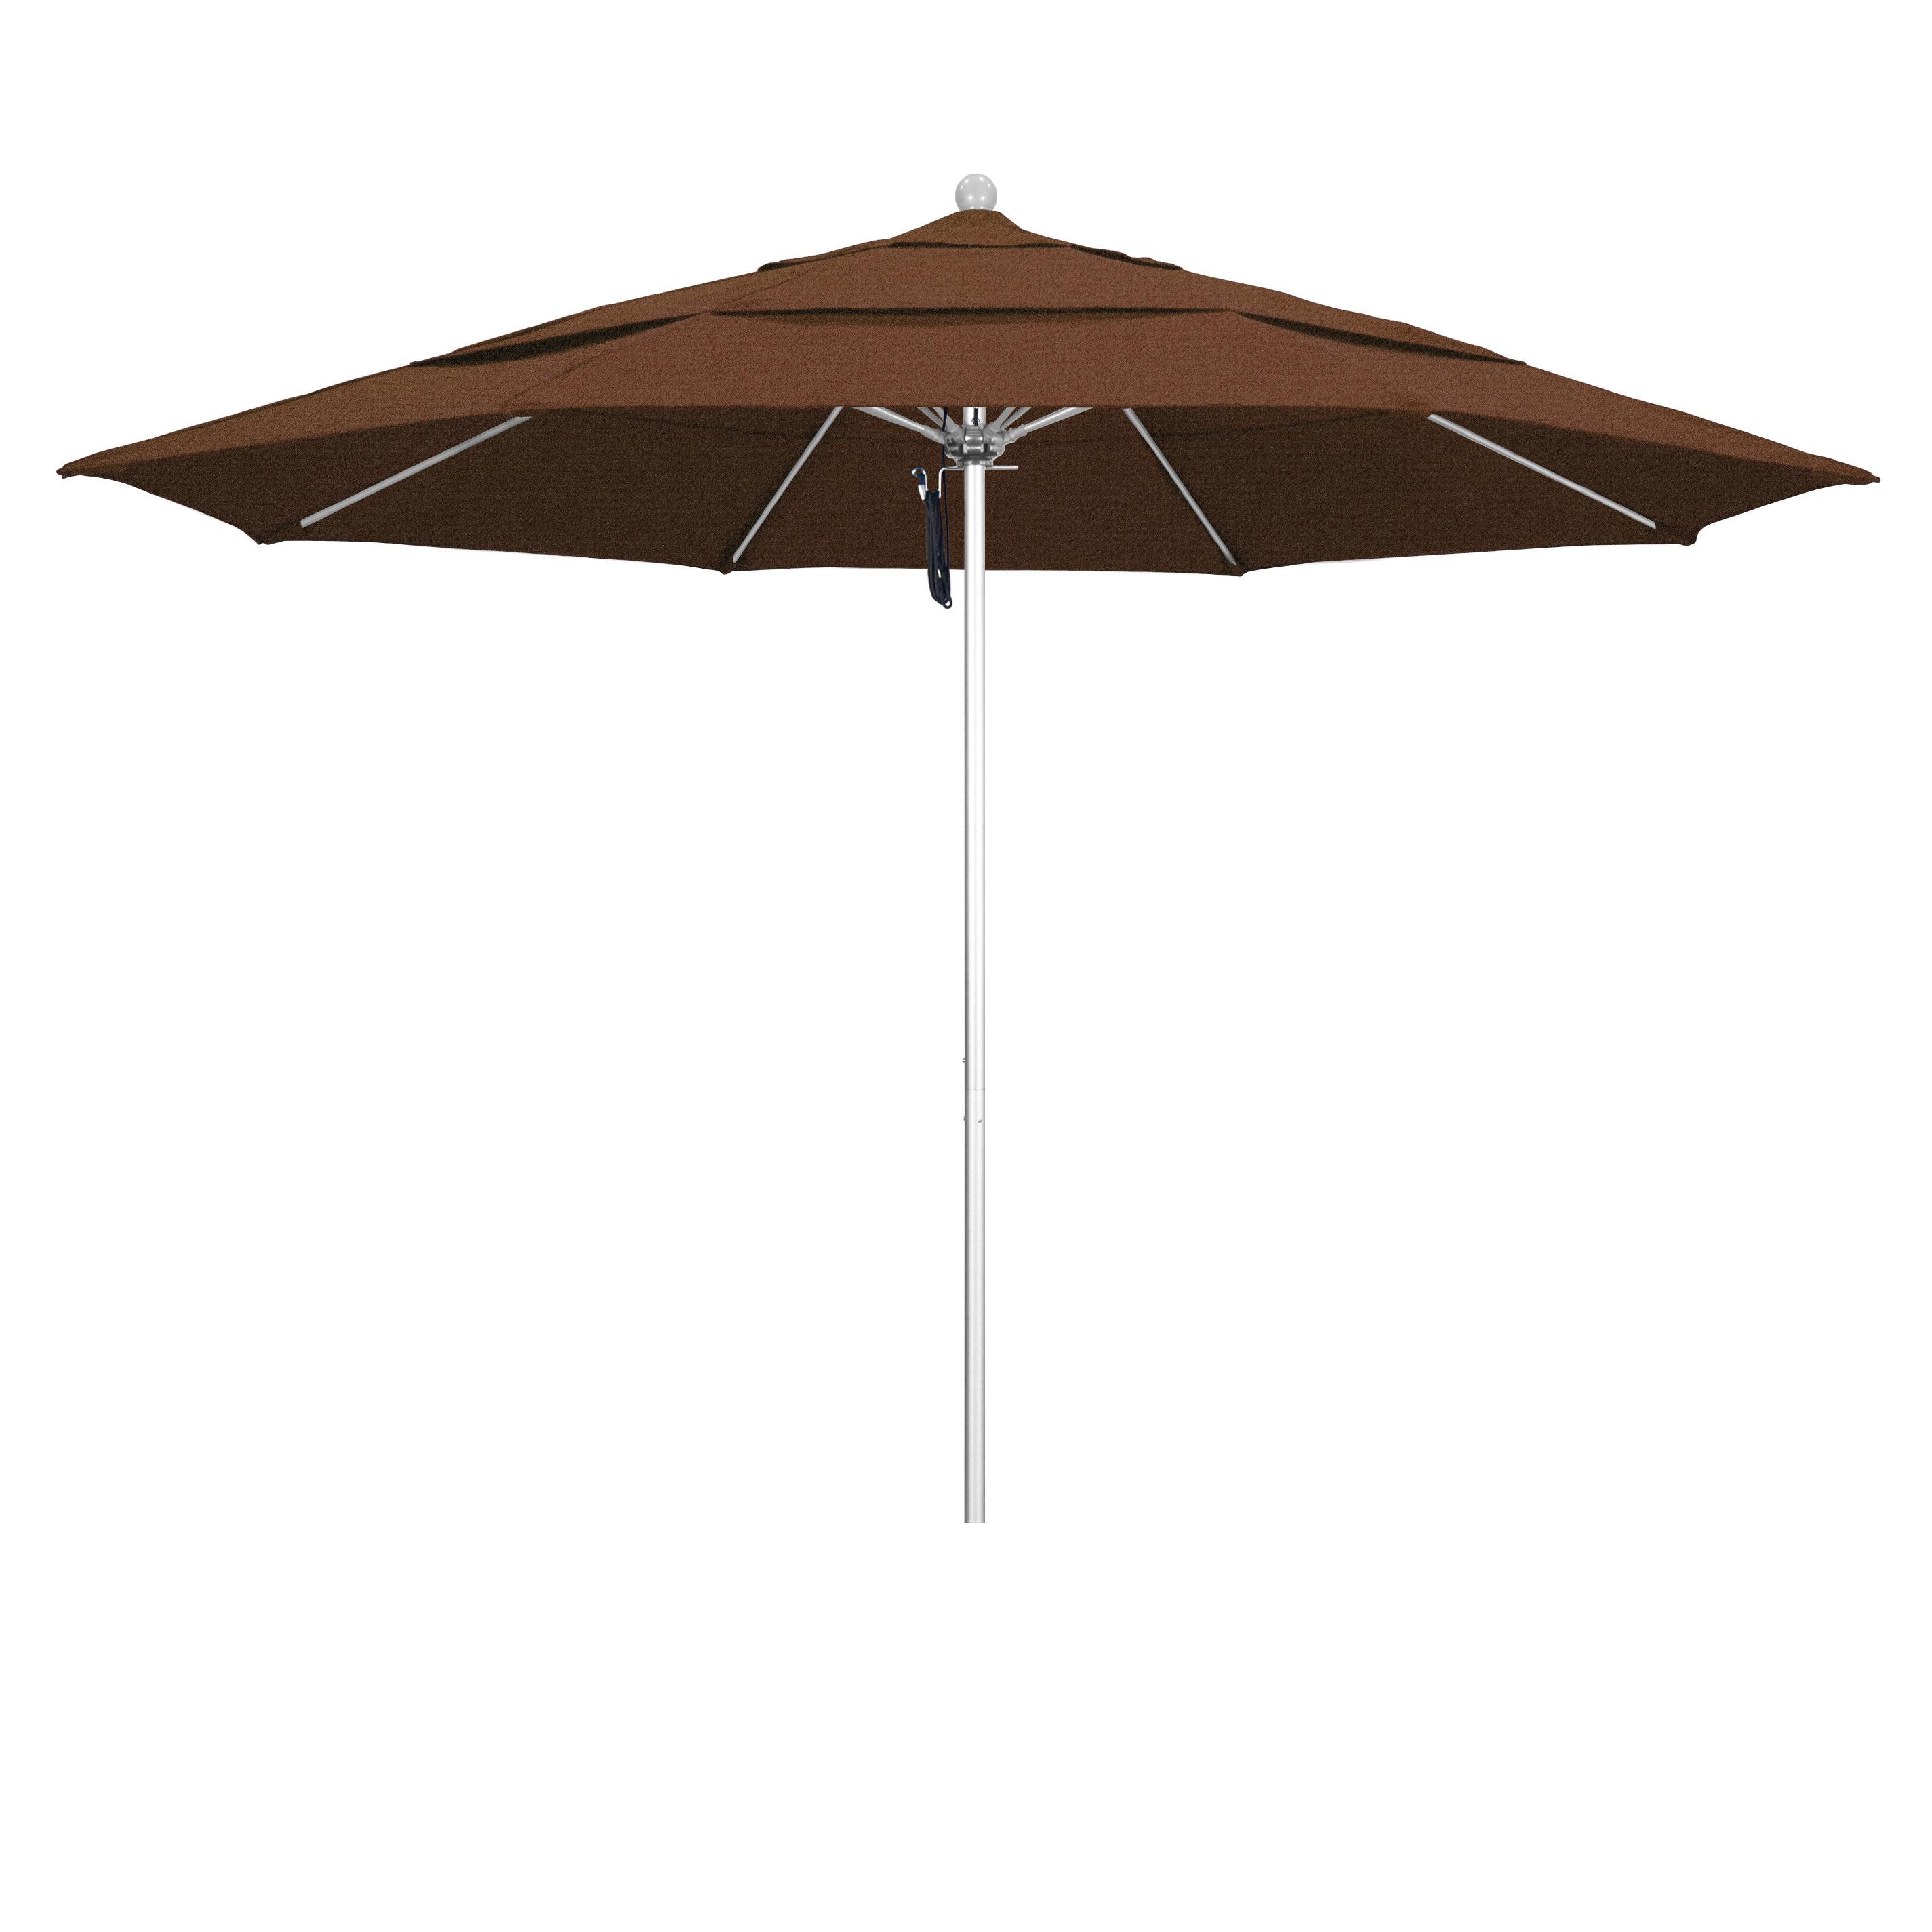 Caravelle 11' Market Umbrella With Regard To Popular Caravelle Market Umbrellas (View 5 of 20)